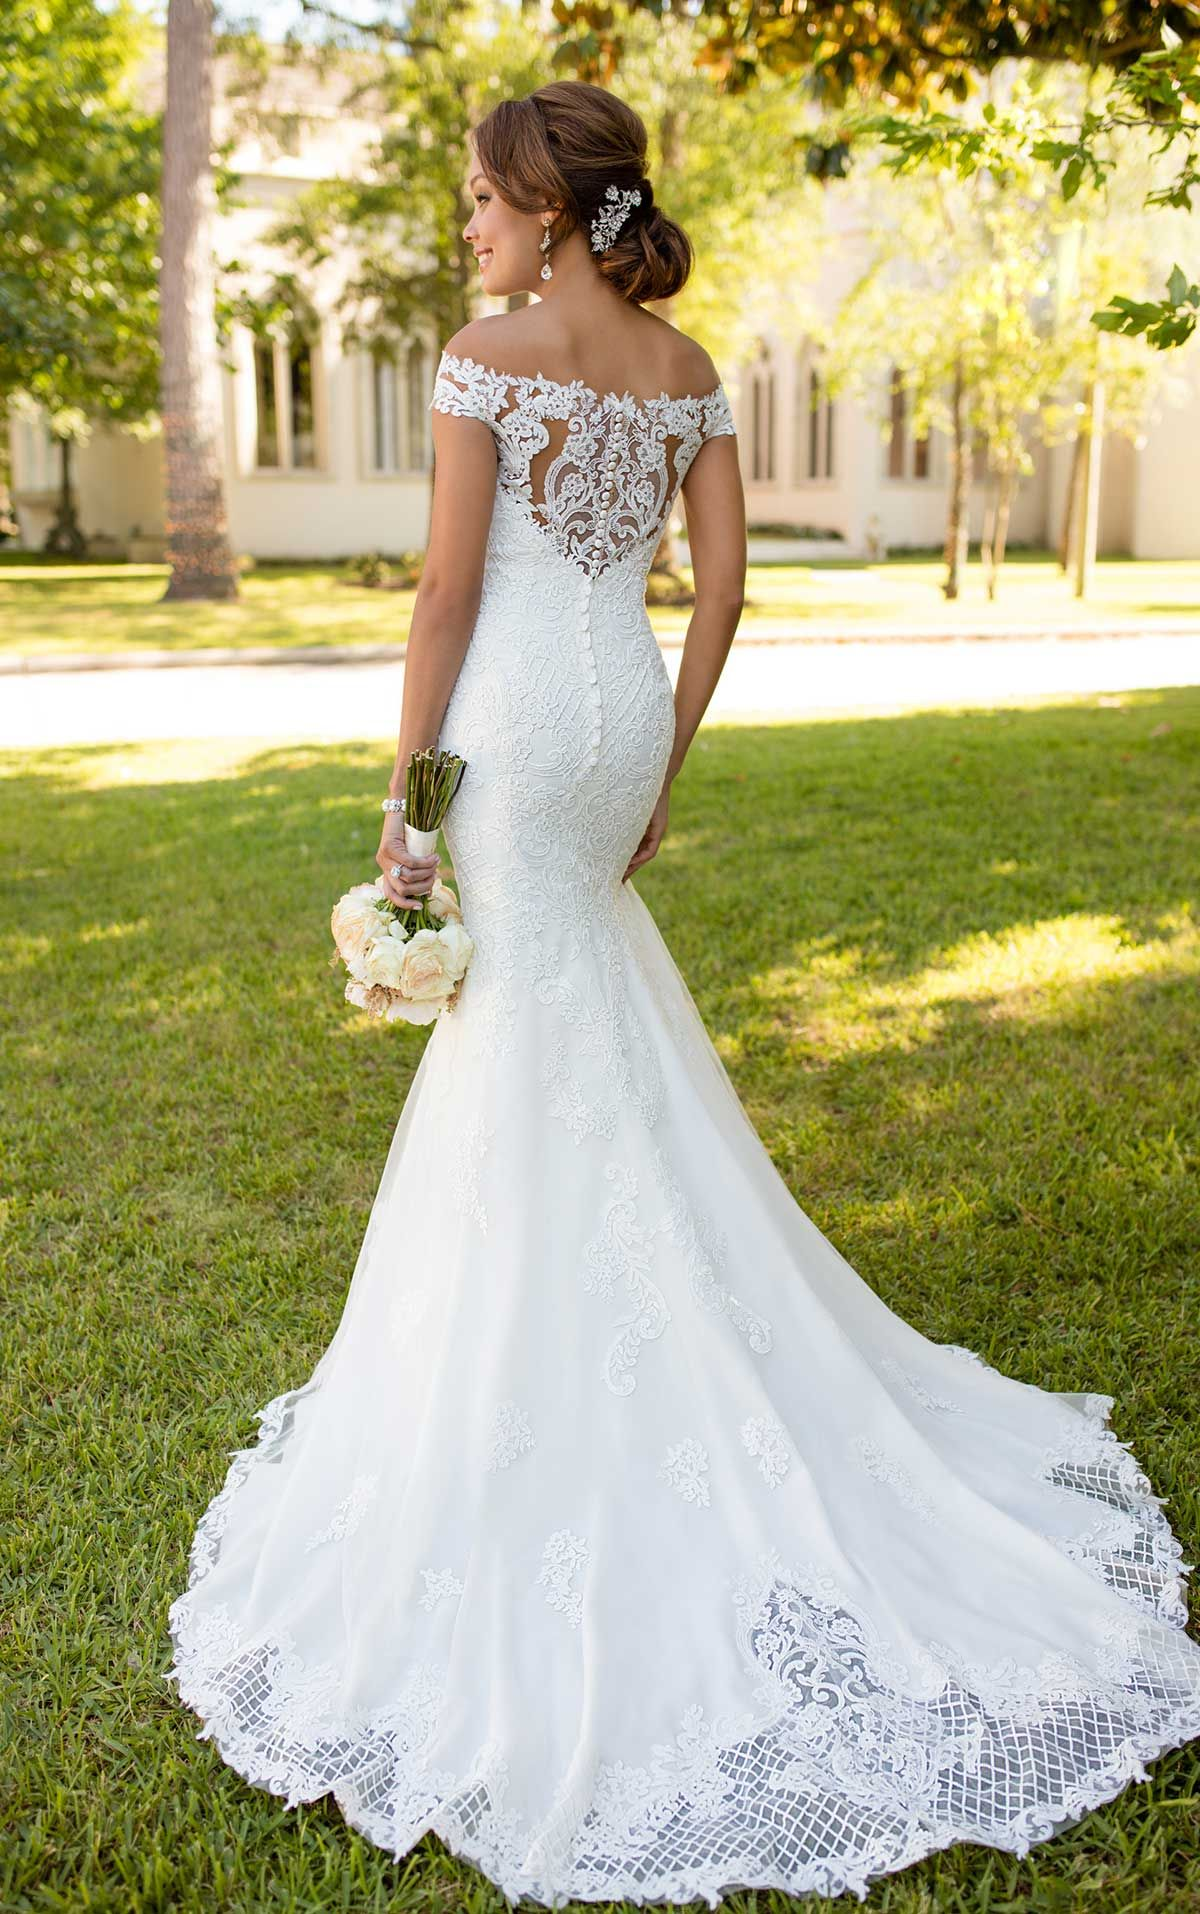 Bohemian lace wedding gown stella york wedding dress and weddings